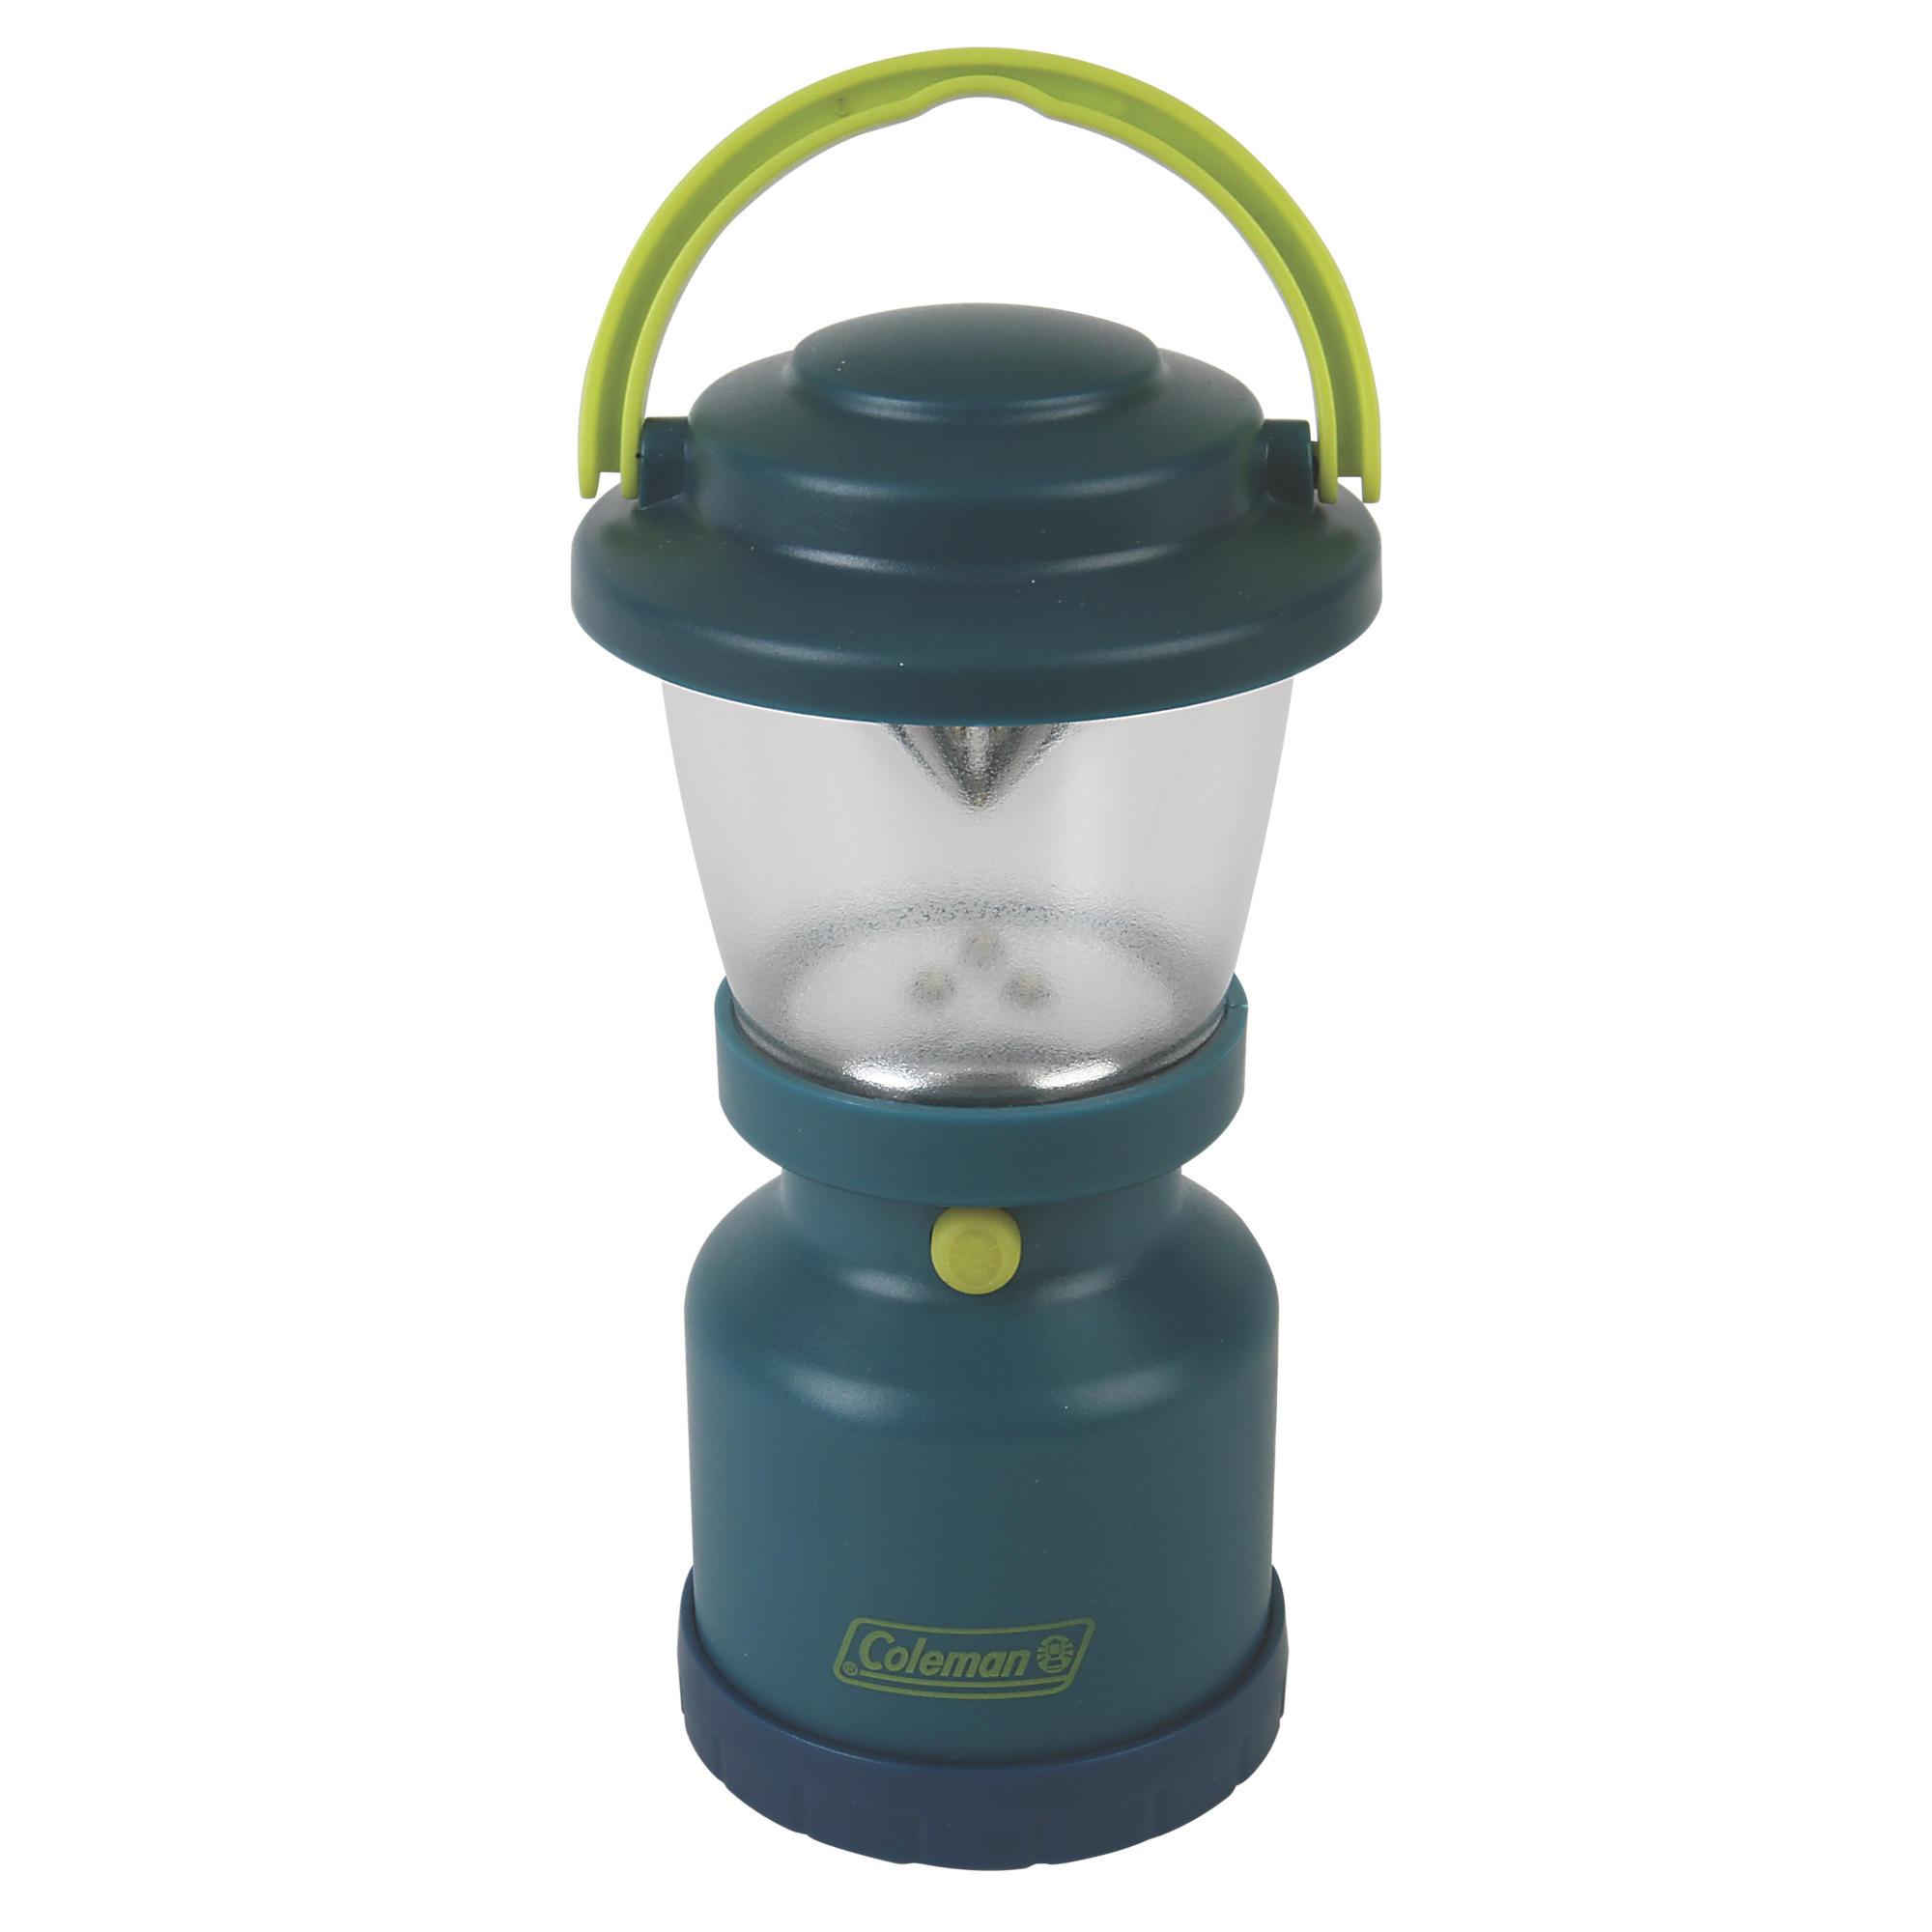 Firefly Youth Lantern